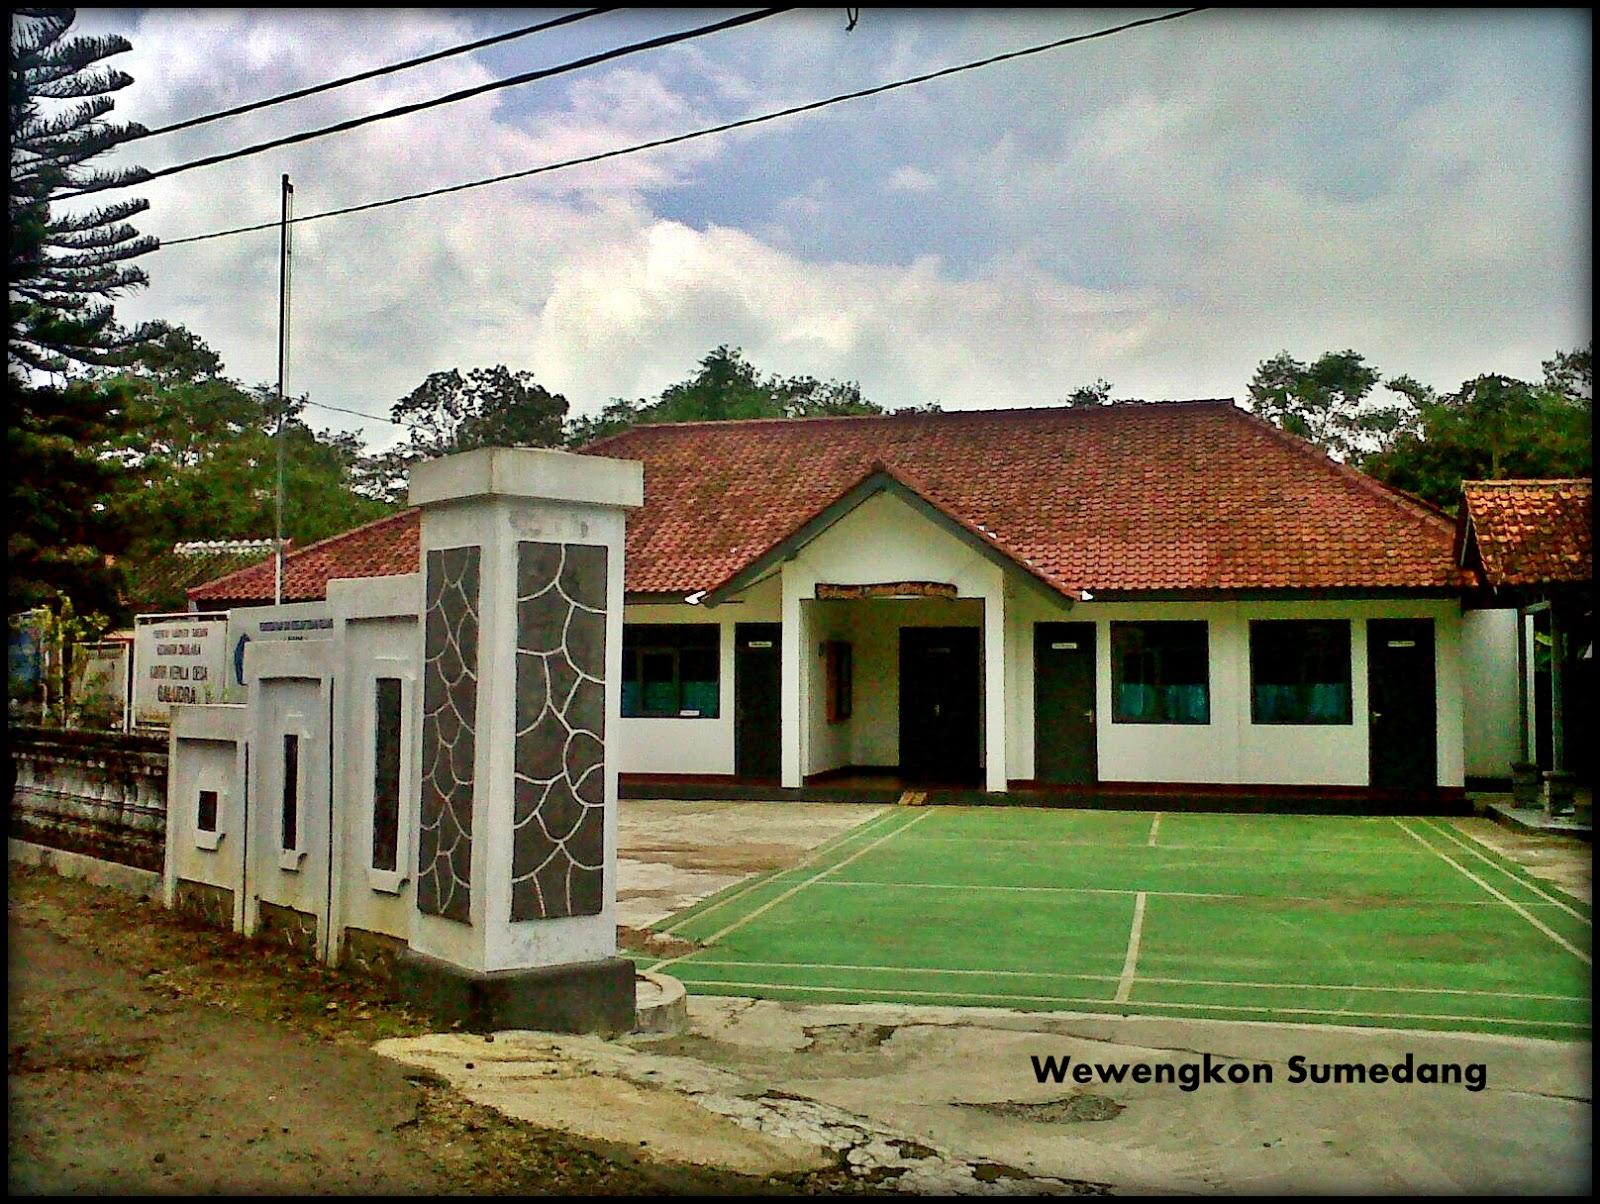 Kantor Desa Galudra, Kab. Sumedang